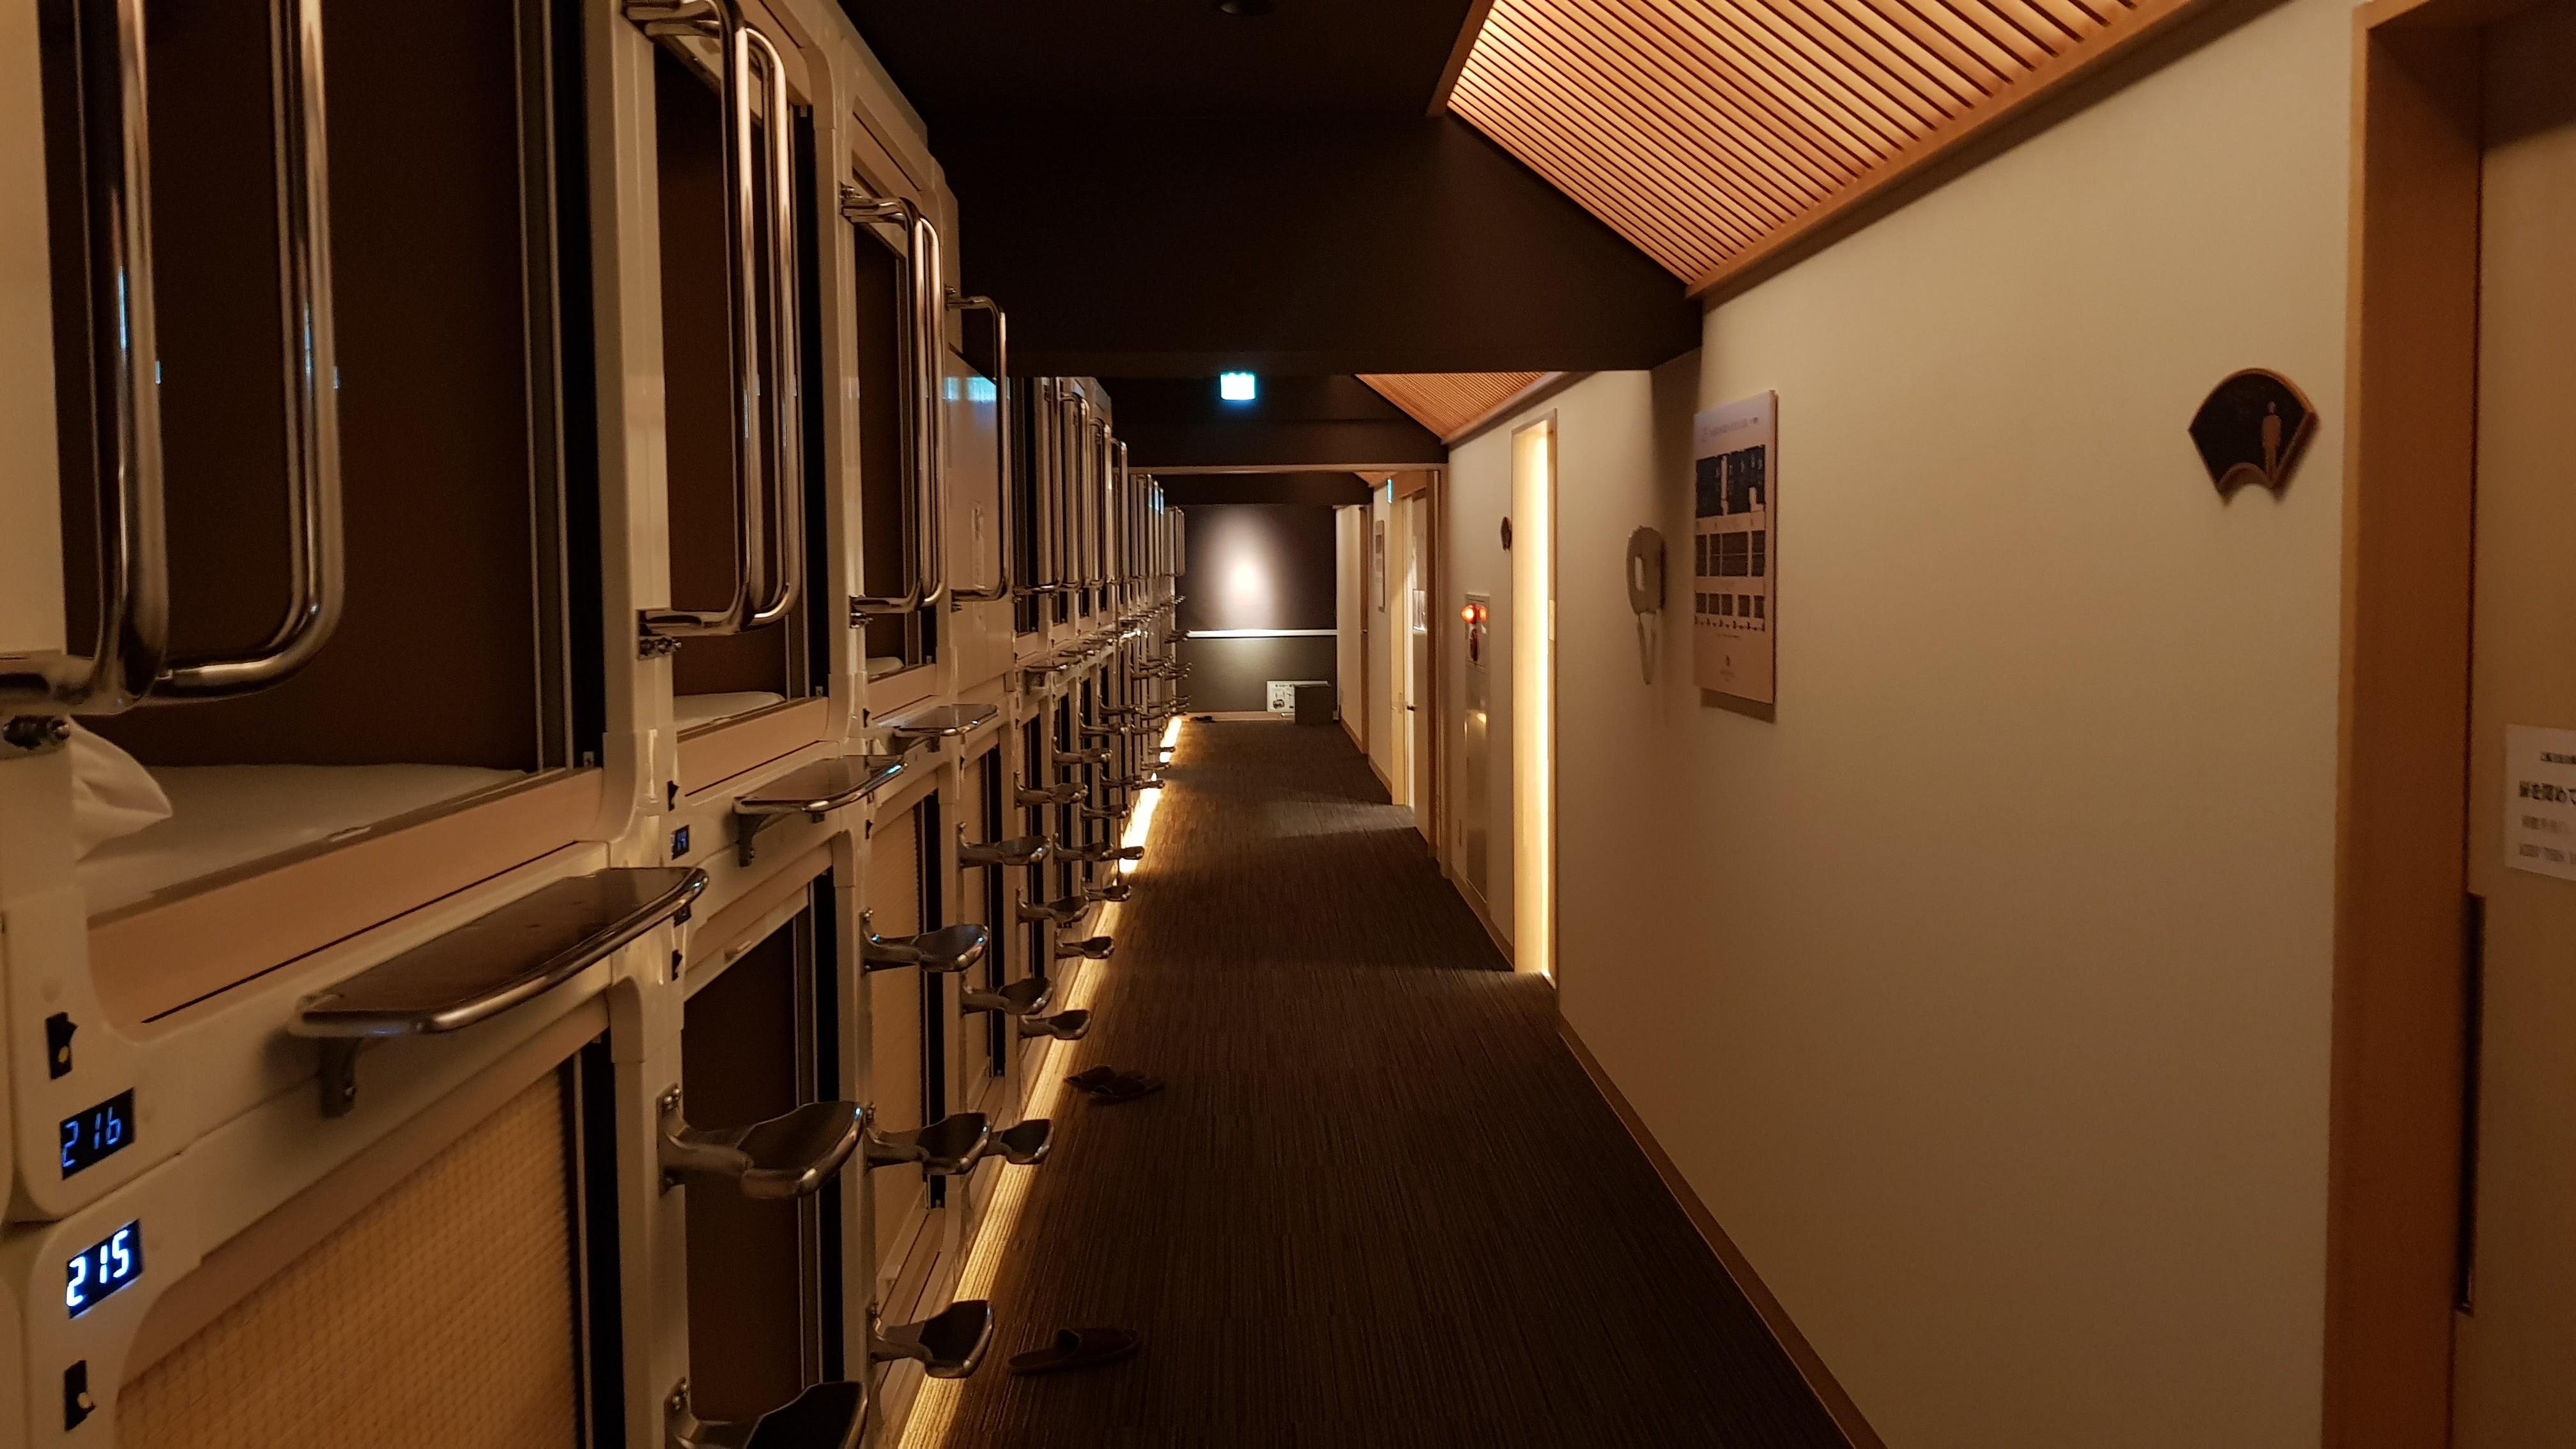 capsule hotel wikipedia